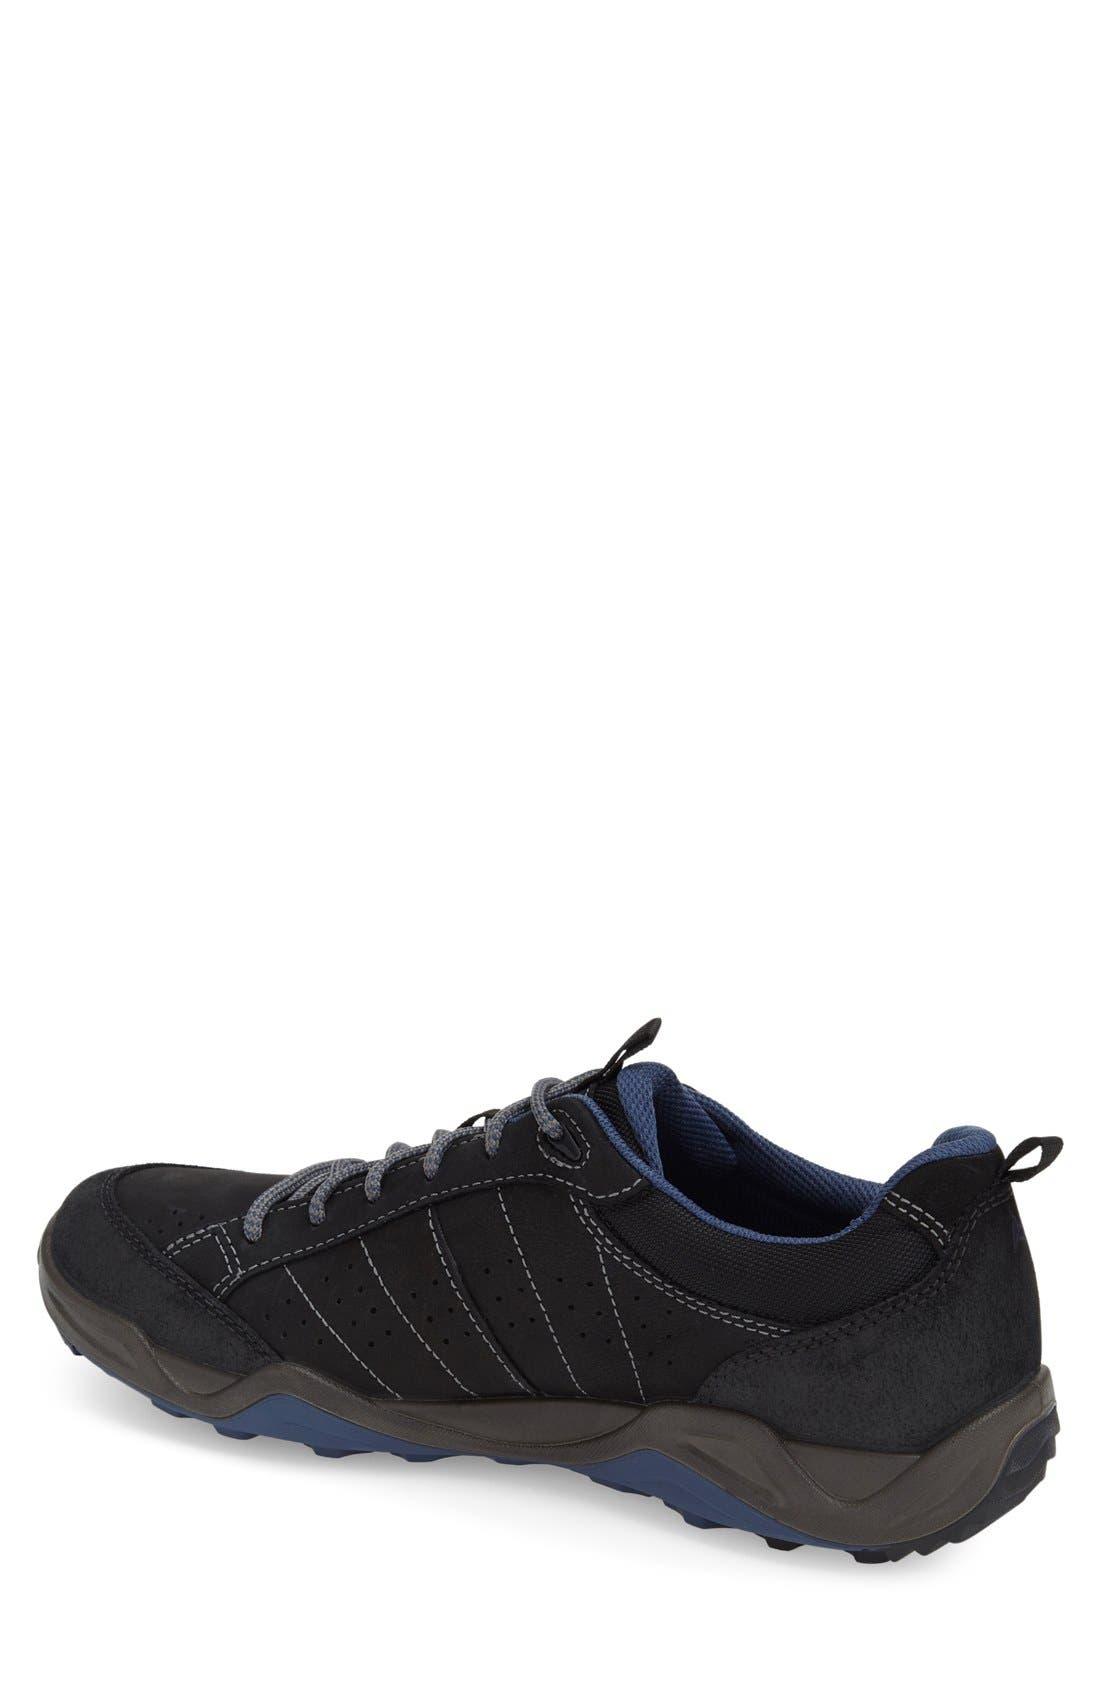 'Sierra II' Sneaker,                             Alternate thumbnail 3, color,                             003